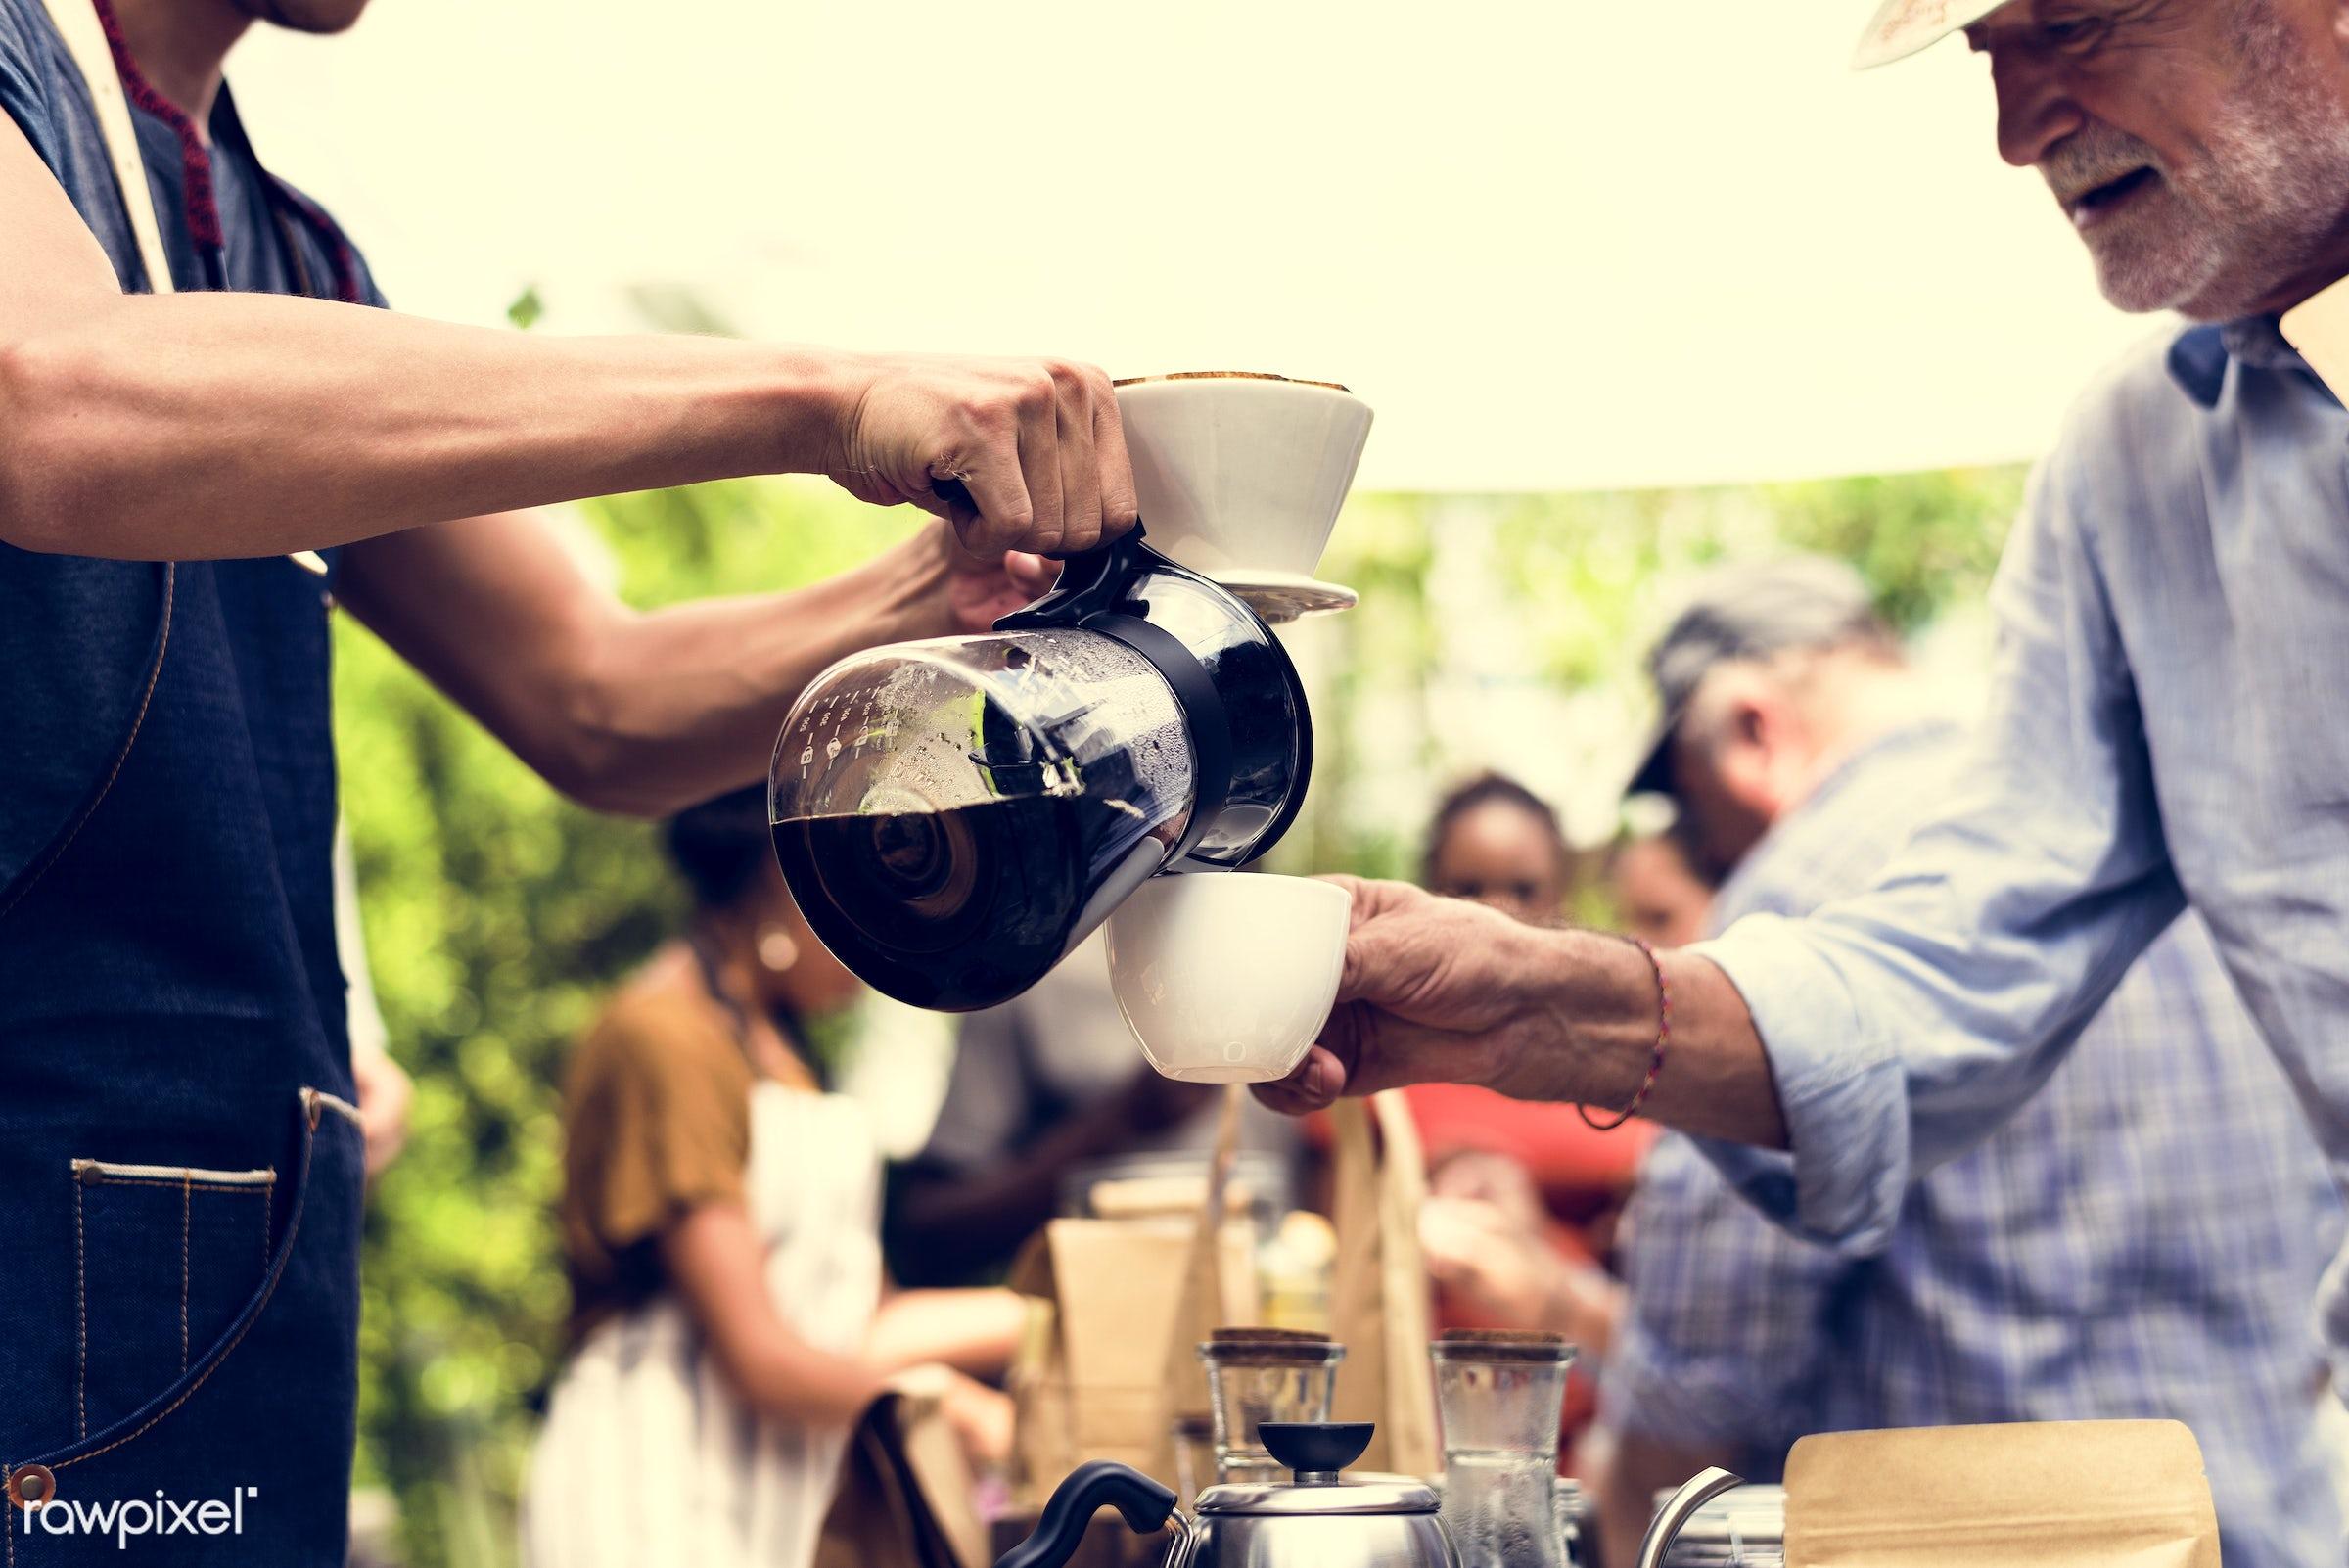 shop, person, aroma, caffeine, people, pot, farmer, brew, blend, lifestyle, drink, refresh, preparation, coffee, refreshment...